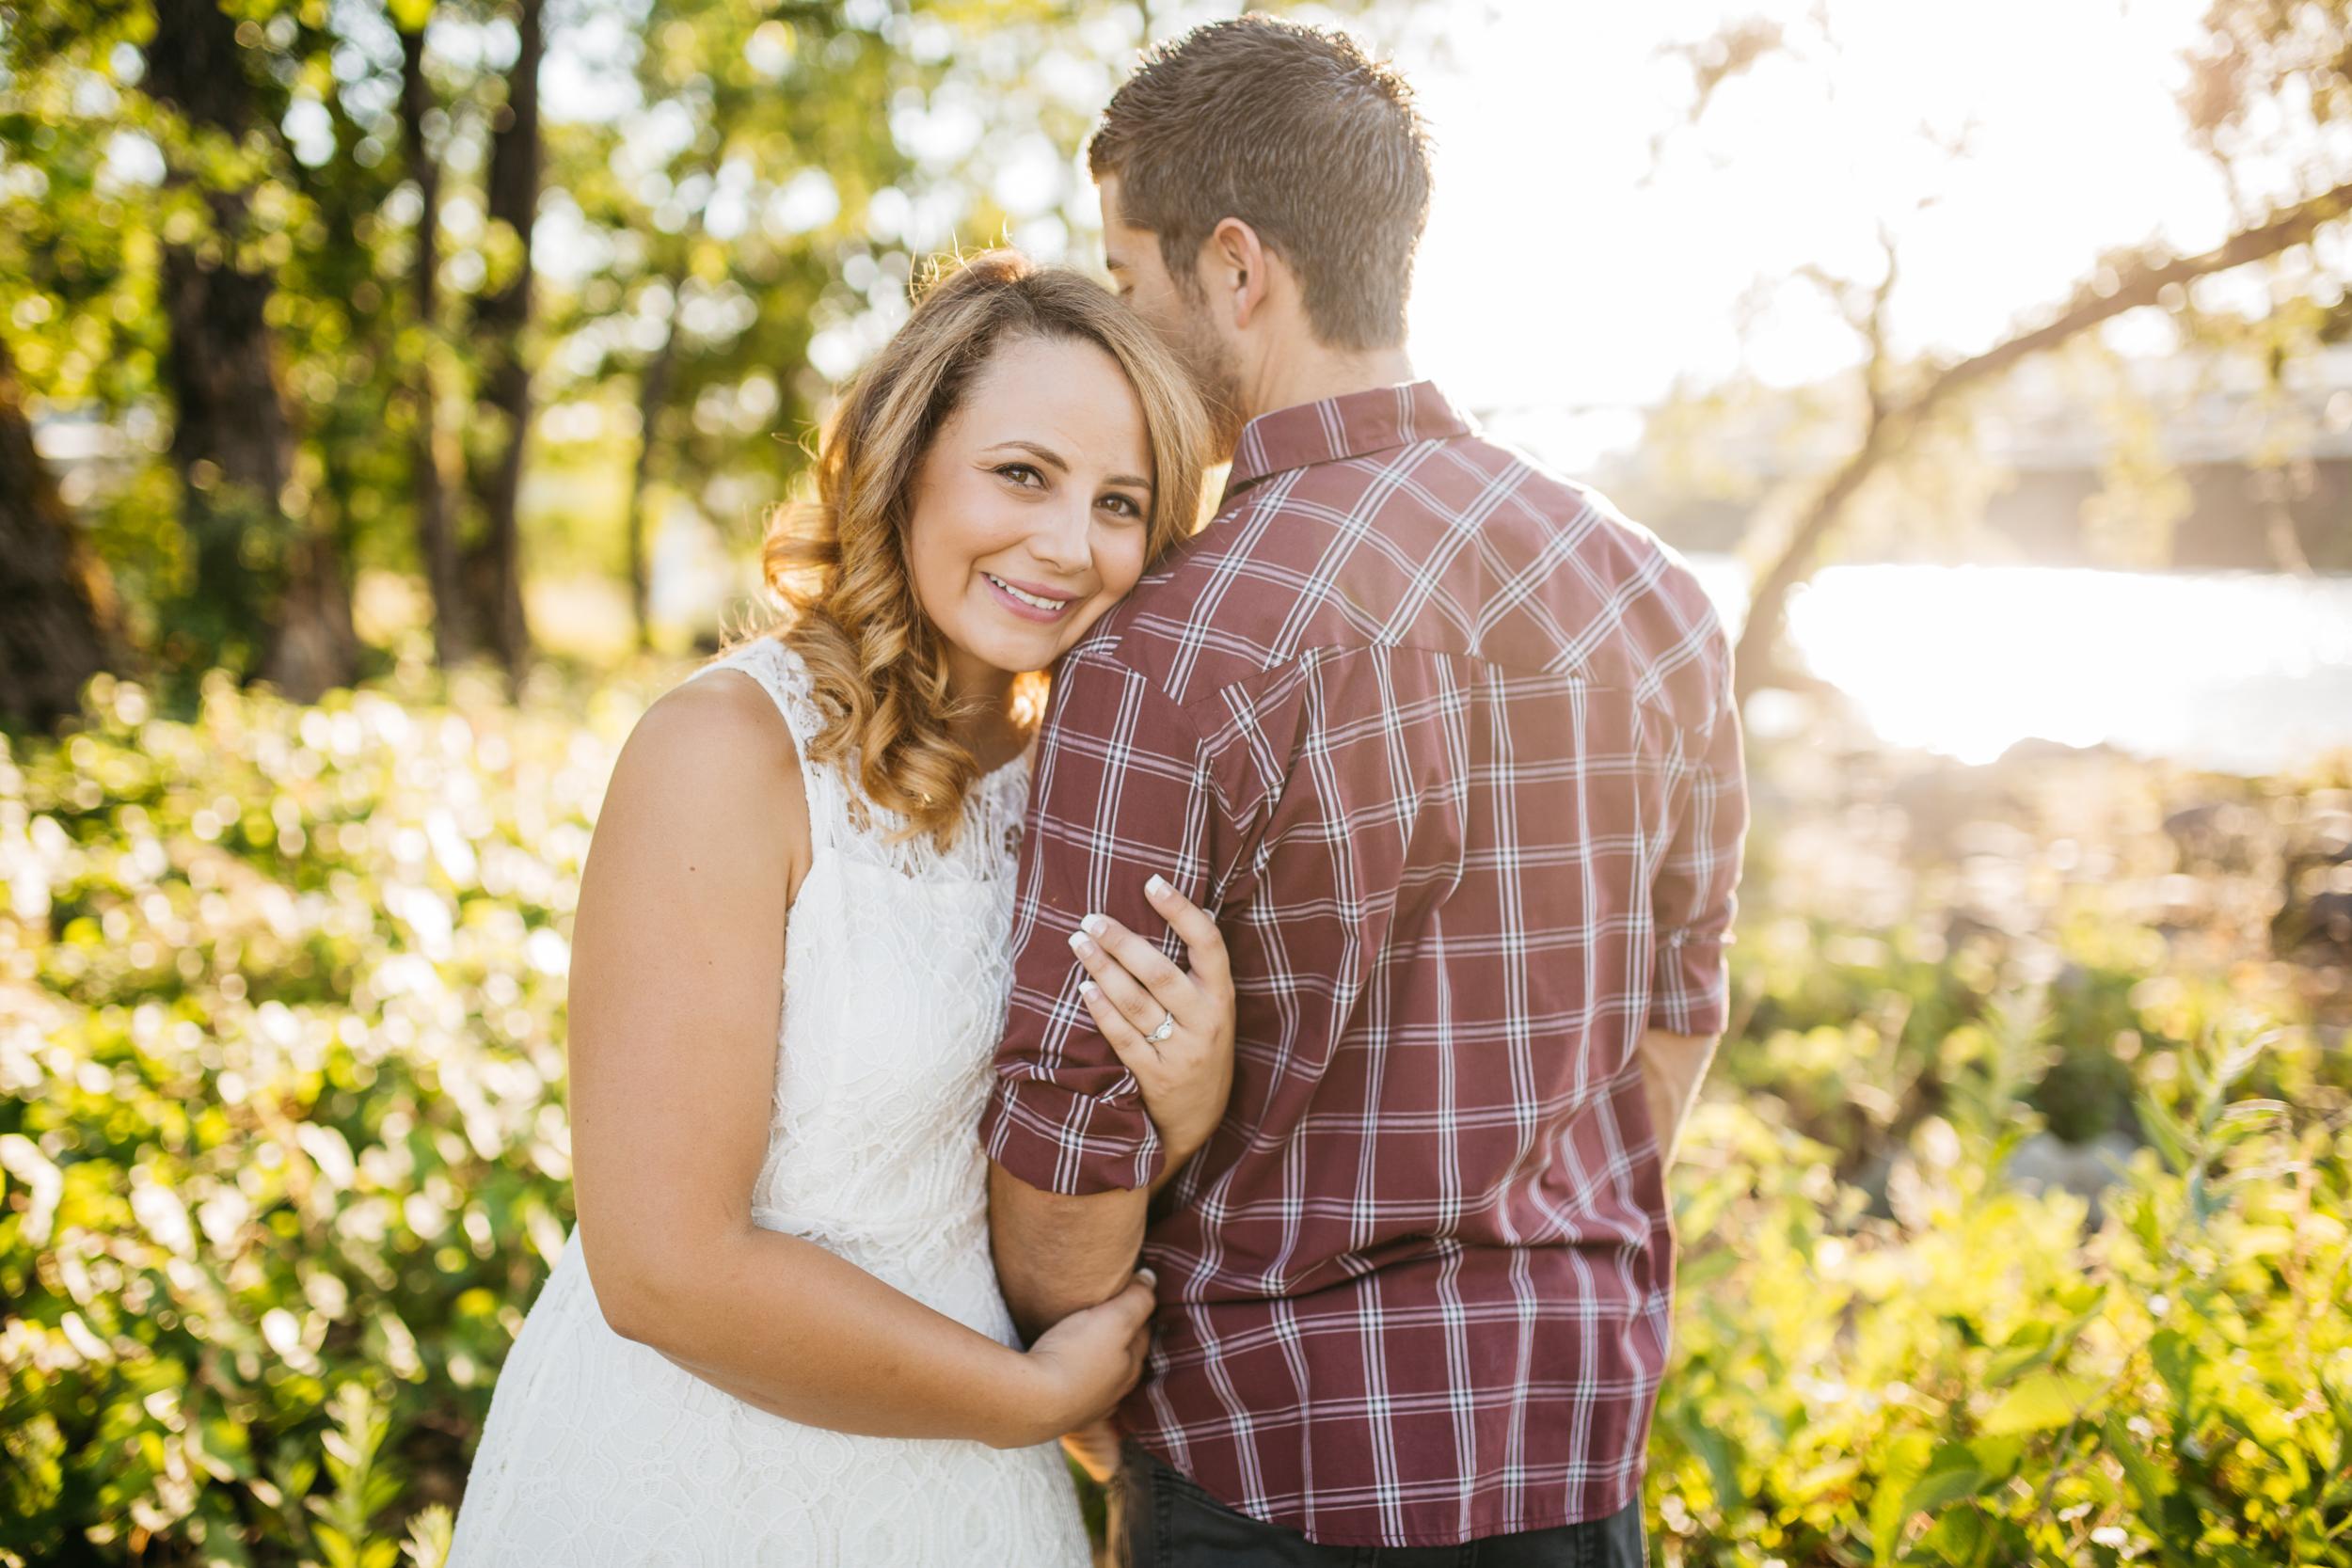 Engagement Photos-Redding-Turtle Bay-Sundial Bridge-Ranalla Photo & Films-Wedding Photography-19.jpg